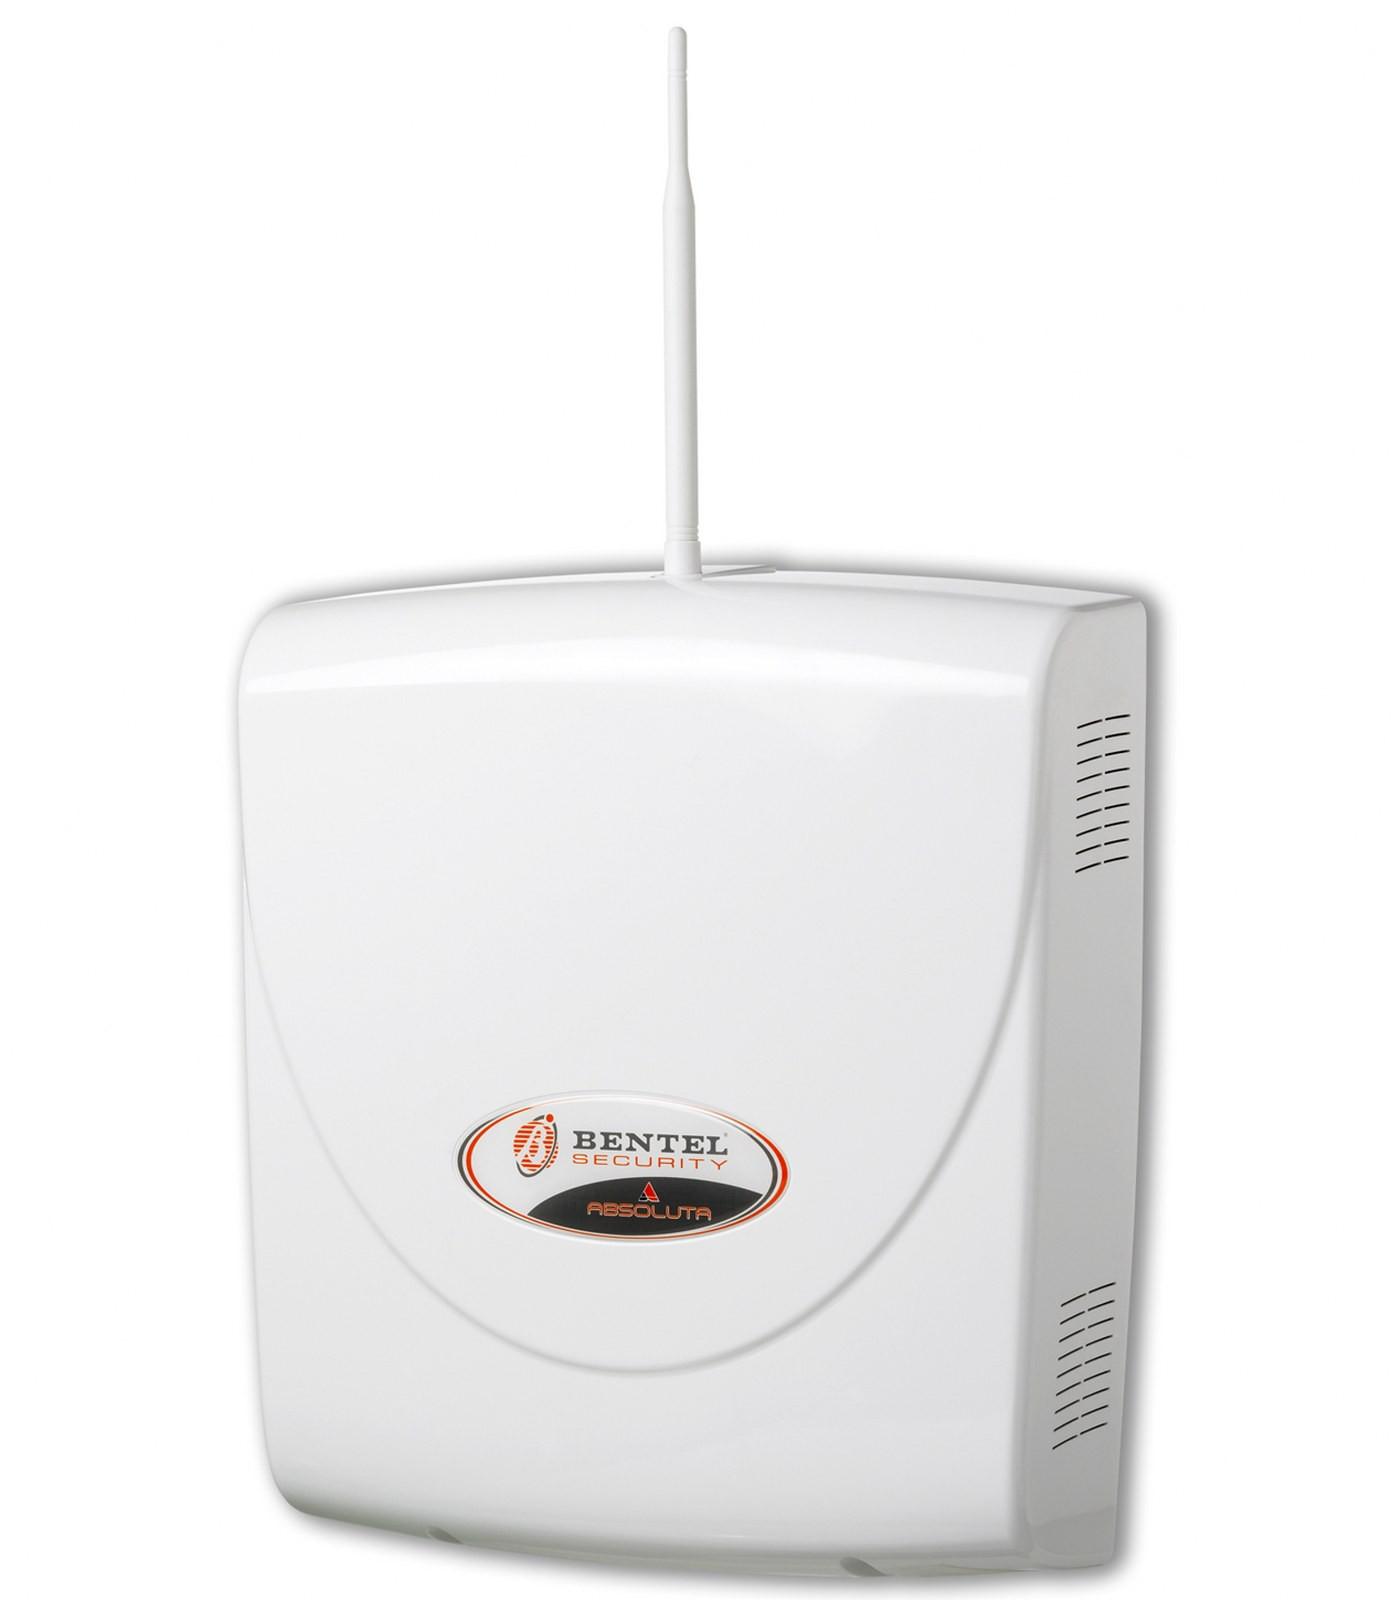 Kit Antifurto Filare 16 Zone Bentel centrale box antenna sirena alimentatore tastiera - Area ...